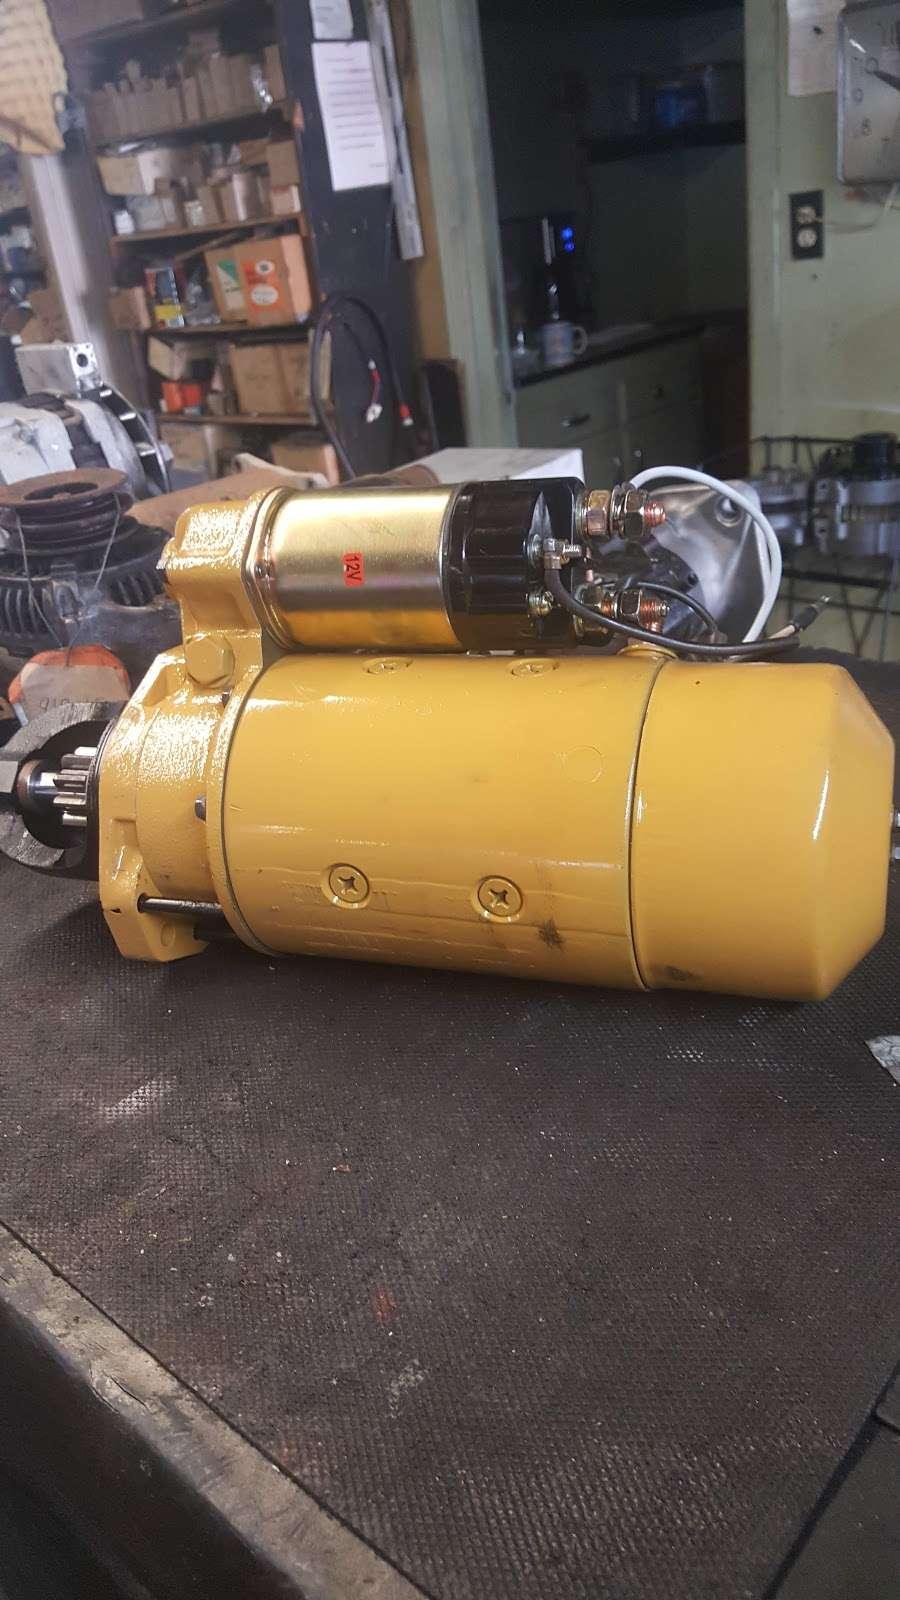 Rayelco Generator Company Inc. - car repair  | Photo 5 of 6 | Address: 7 Ave B, Lodi, NJ 07644, USA | Phone: (973) 777-3514